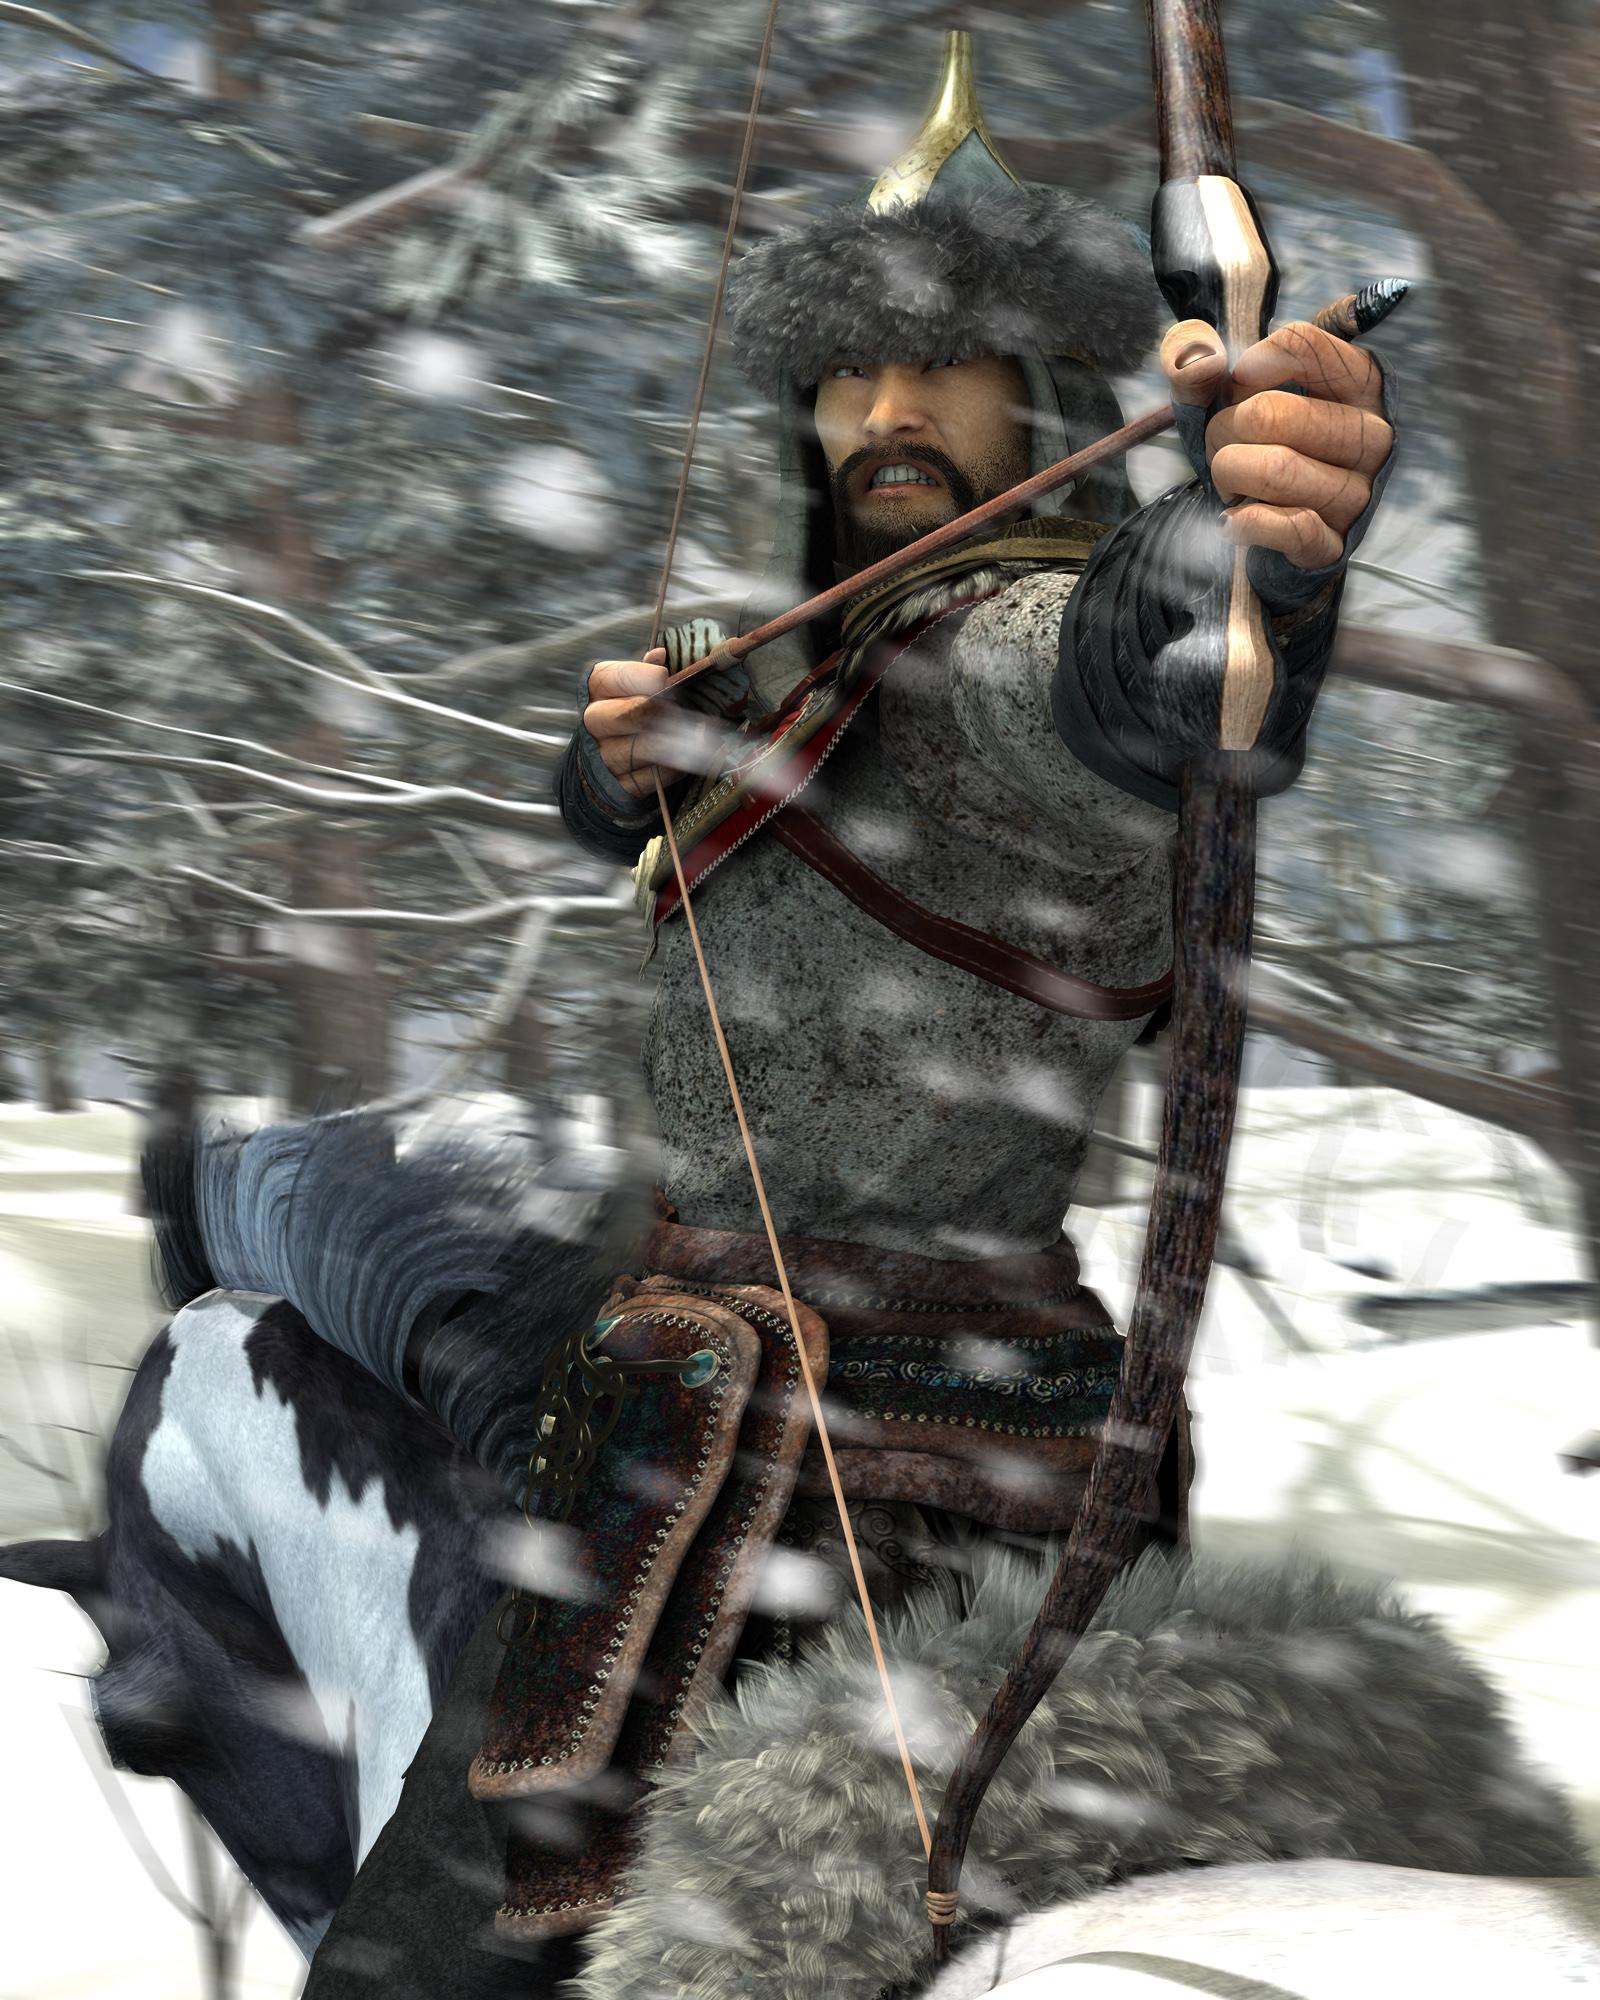 Ganbaatar, the mongolian warrior